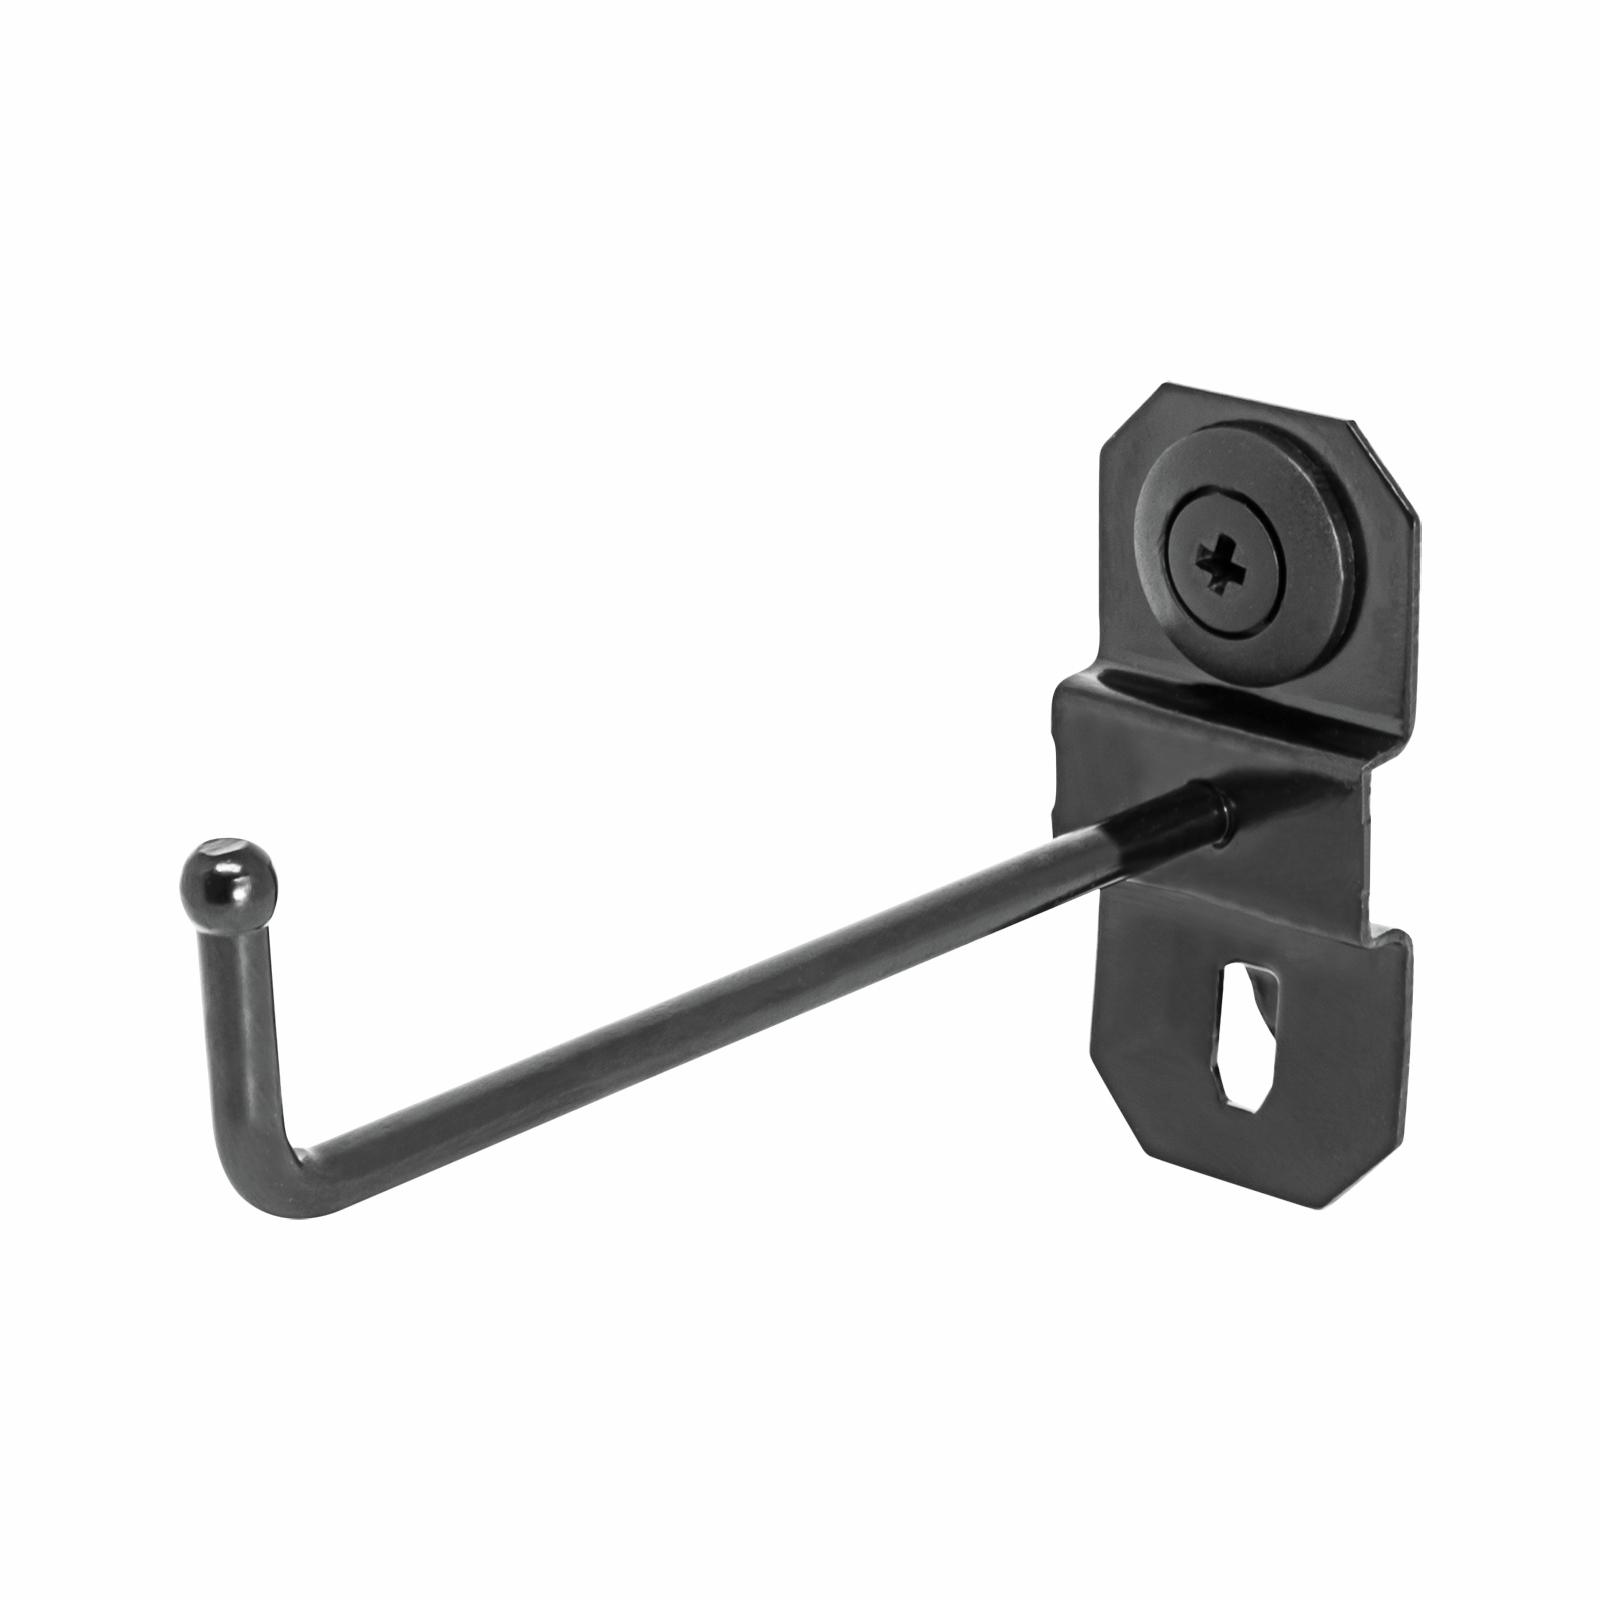 Pinnacle Gloss Black Heavy Duty Single Prong Pegboard Hook - 10 Pack